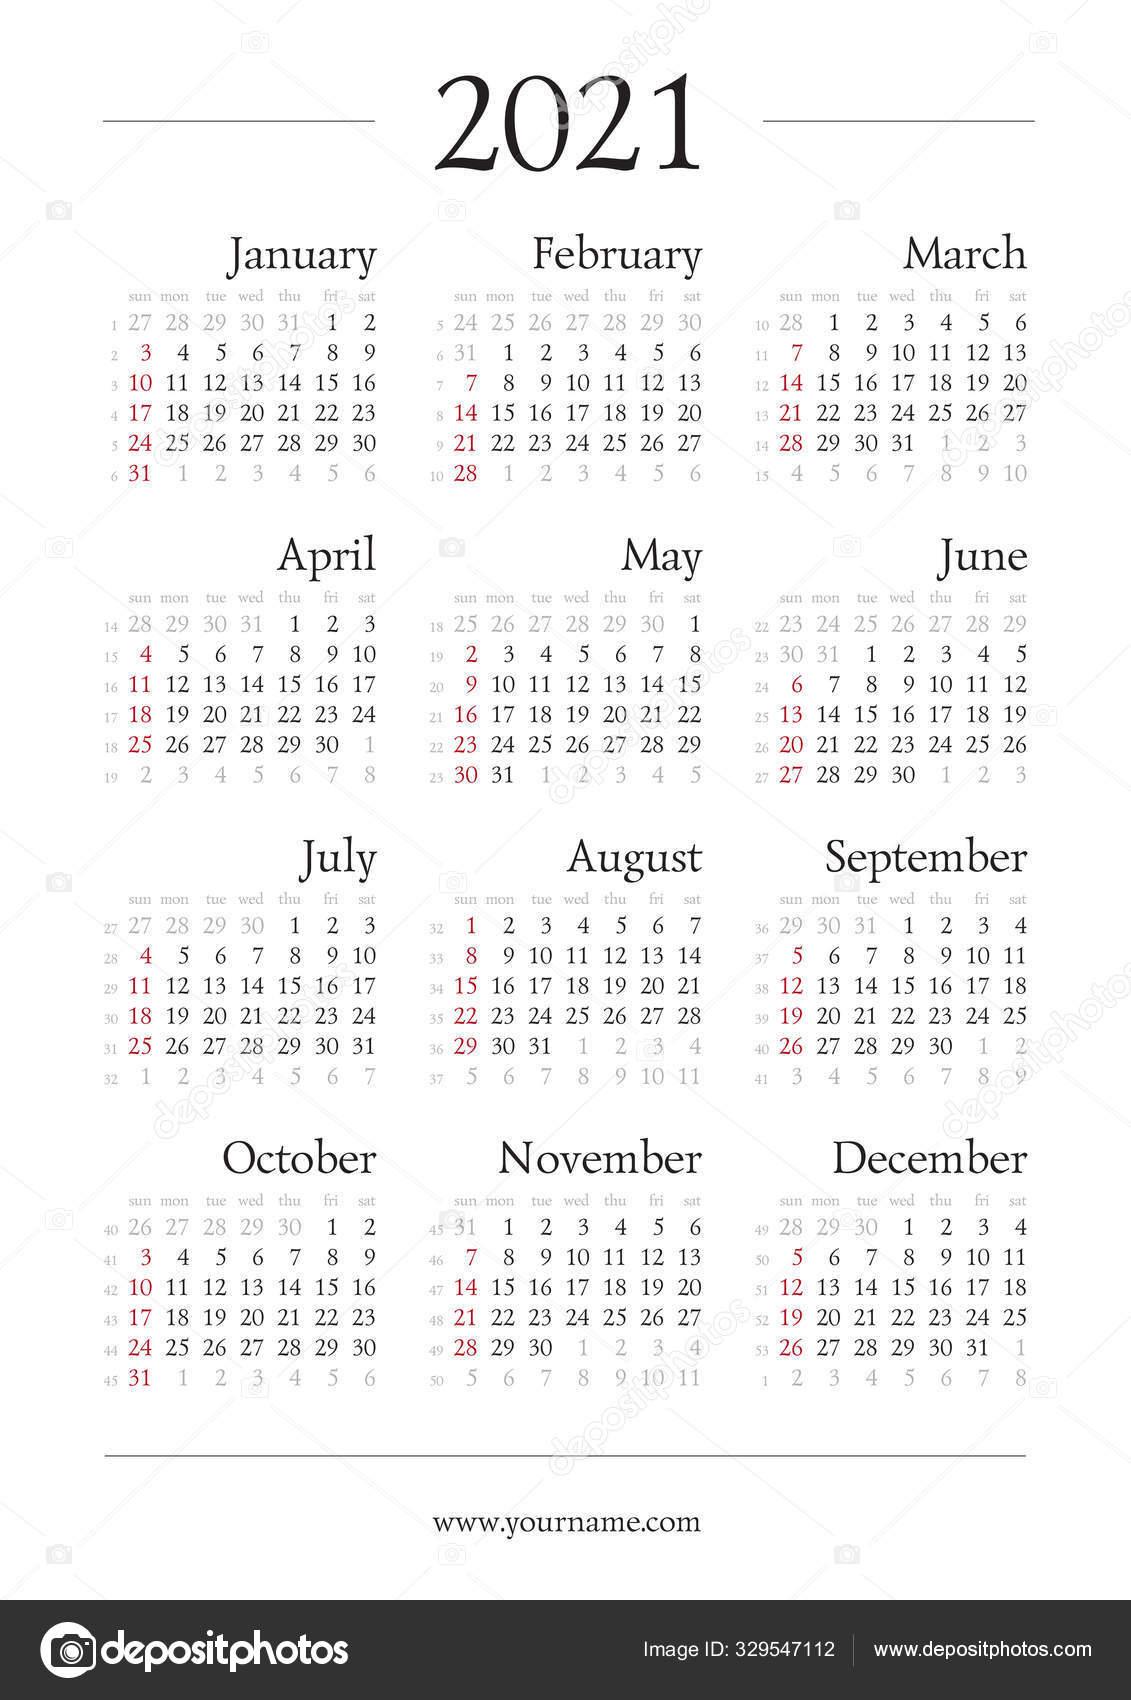 Gregorian Calendar 2021 With Week Numbers | Free Printable throughout Julian Date Calendar For 2022